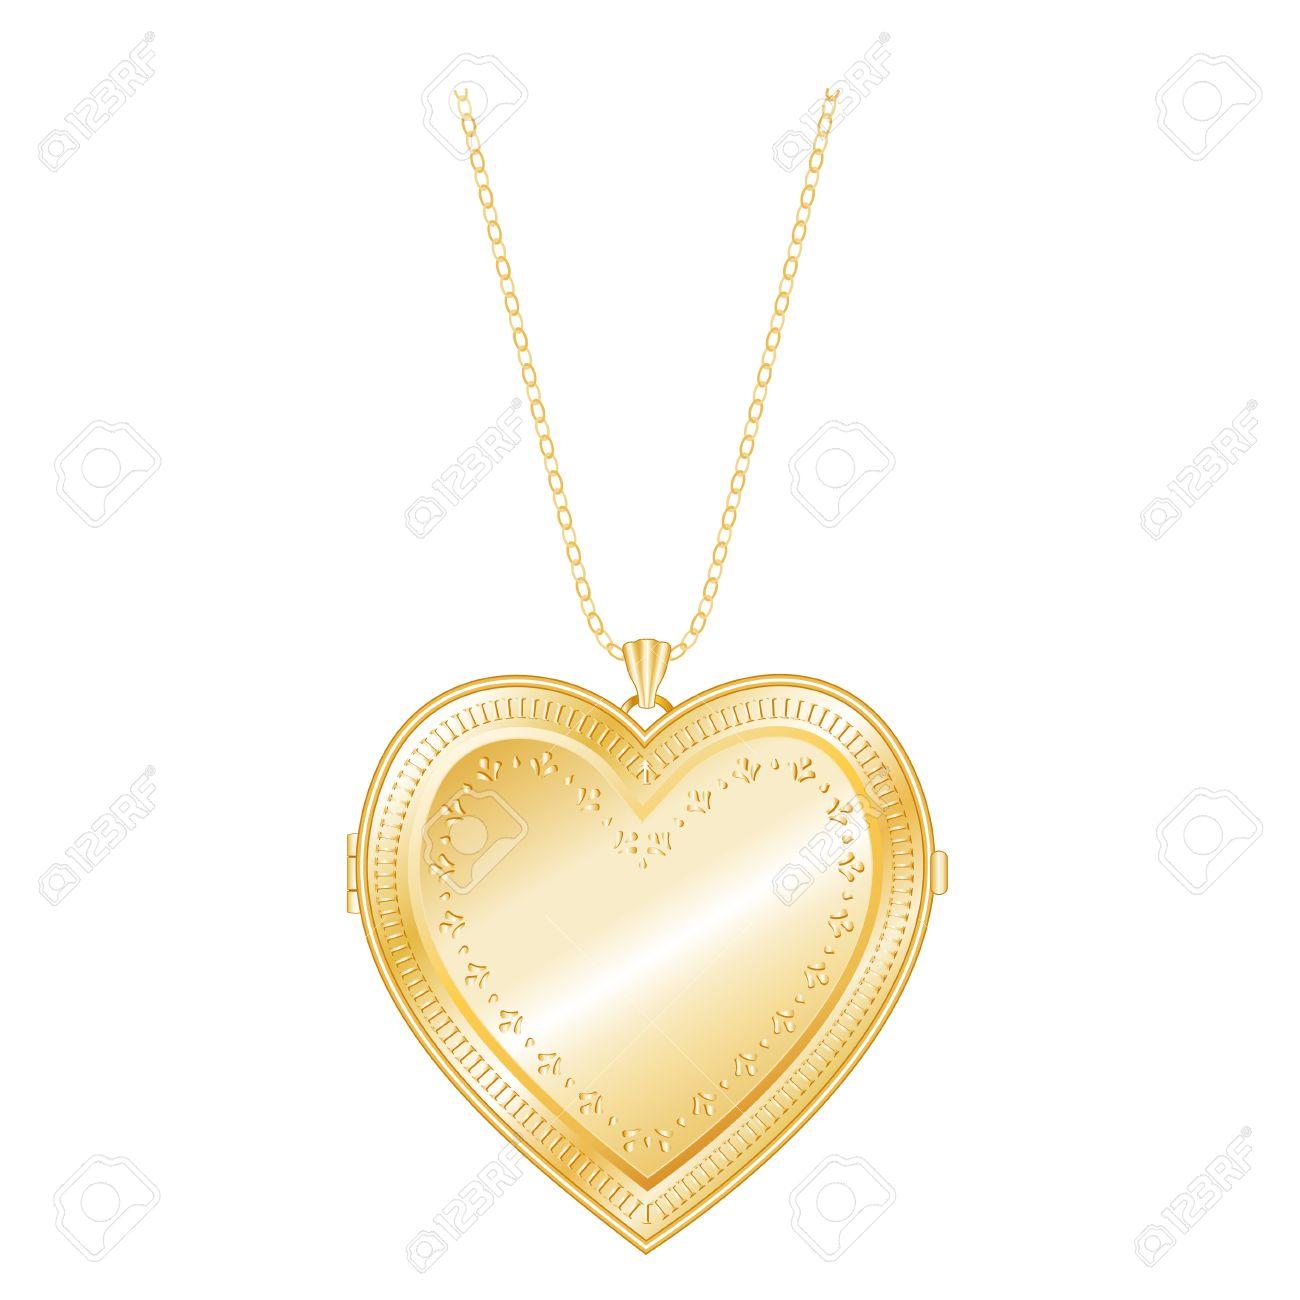 Vintage Keepsake Gold Heart Locket, Chain Necklace, Isolate.